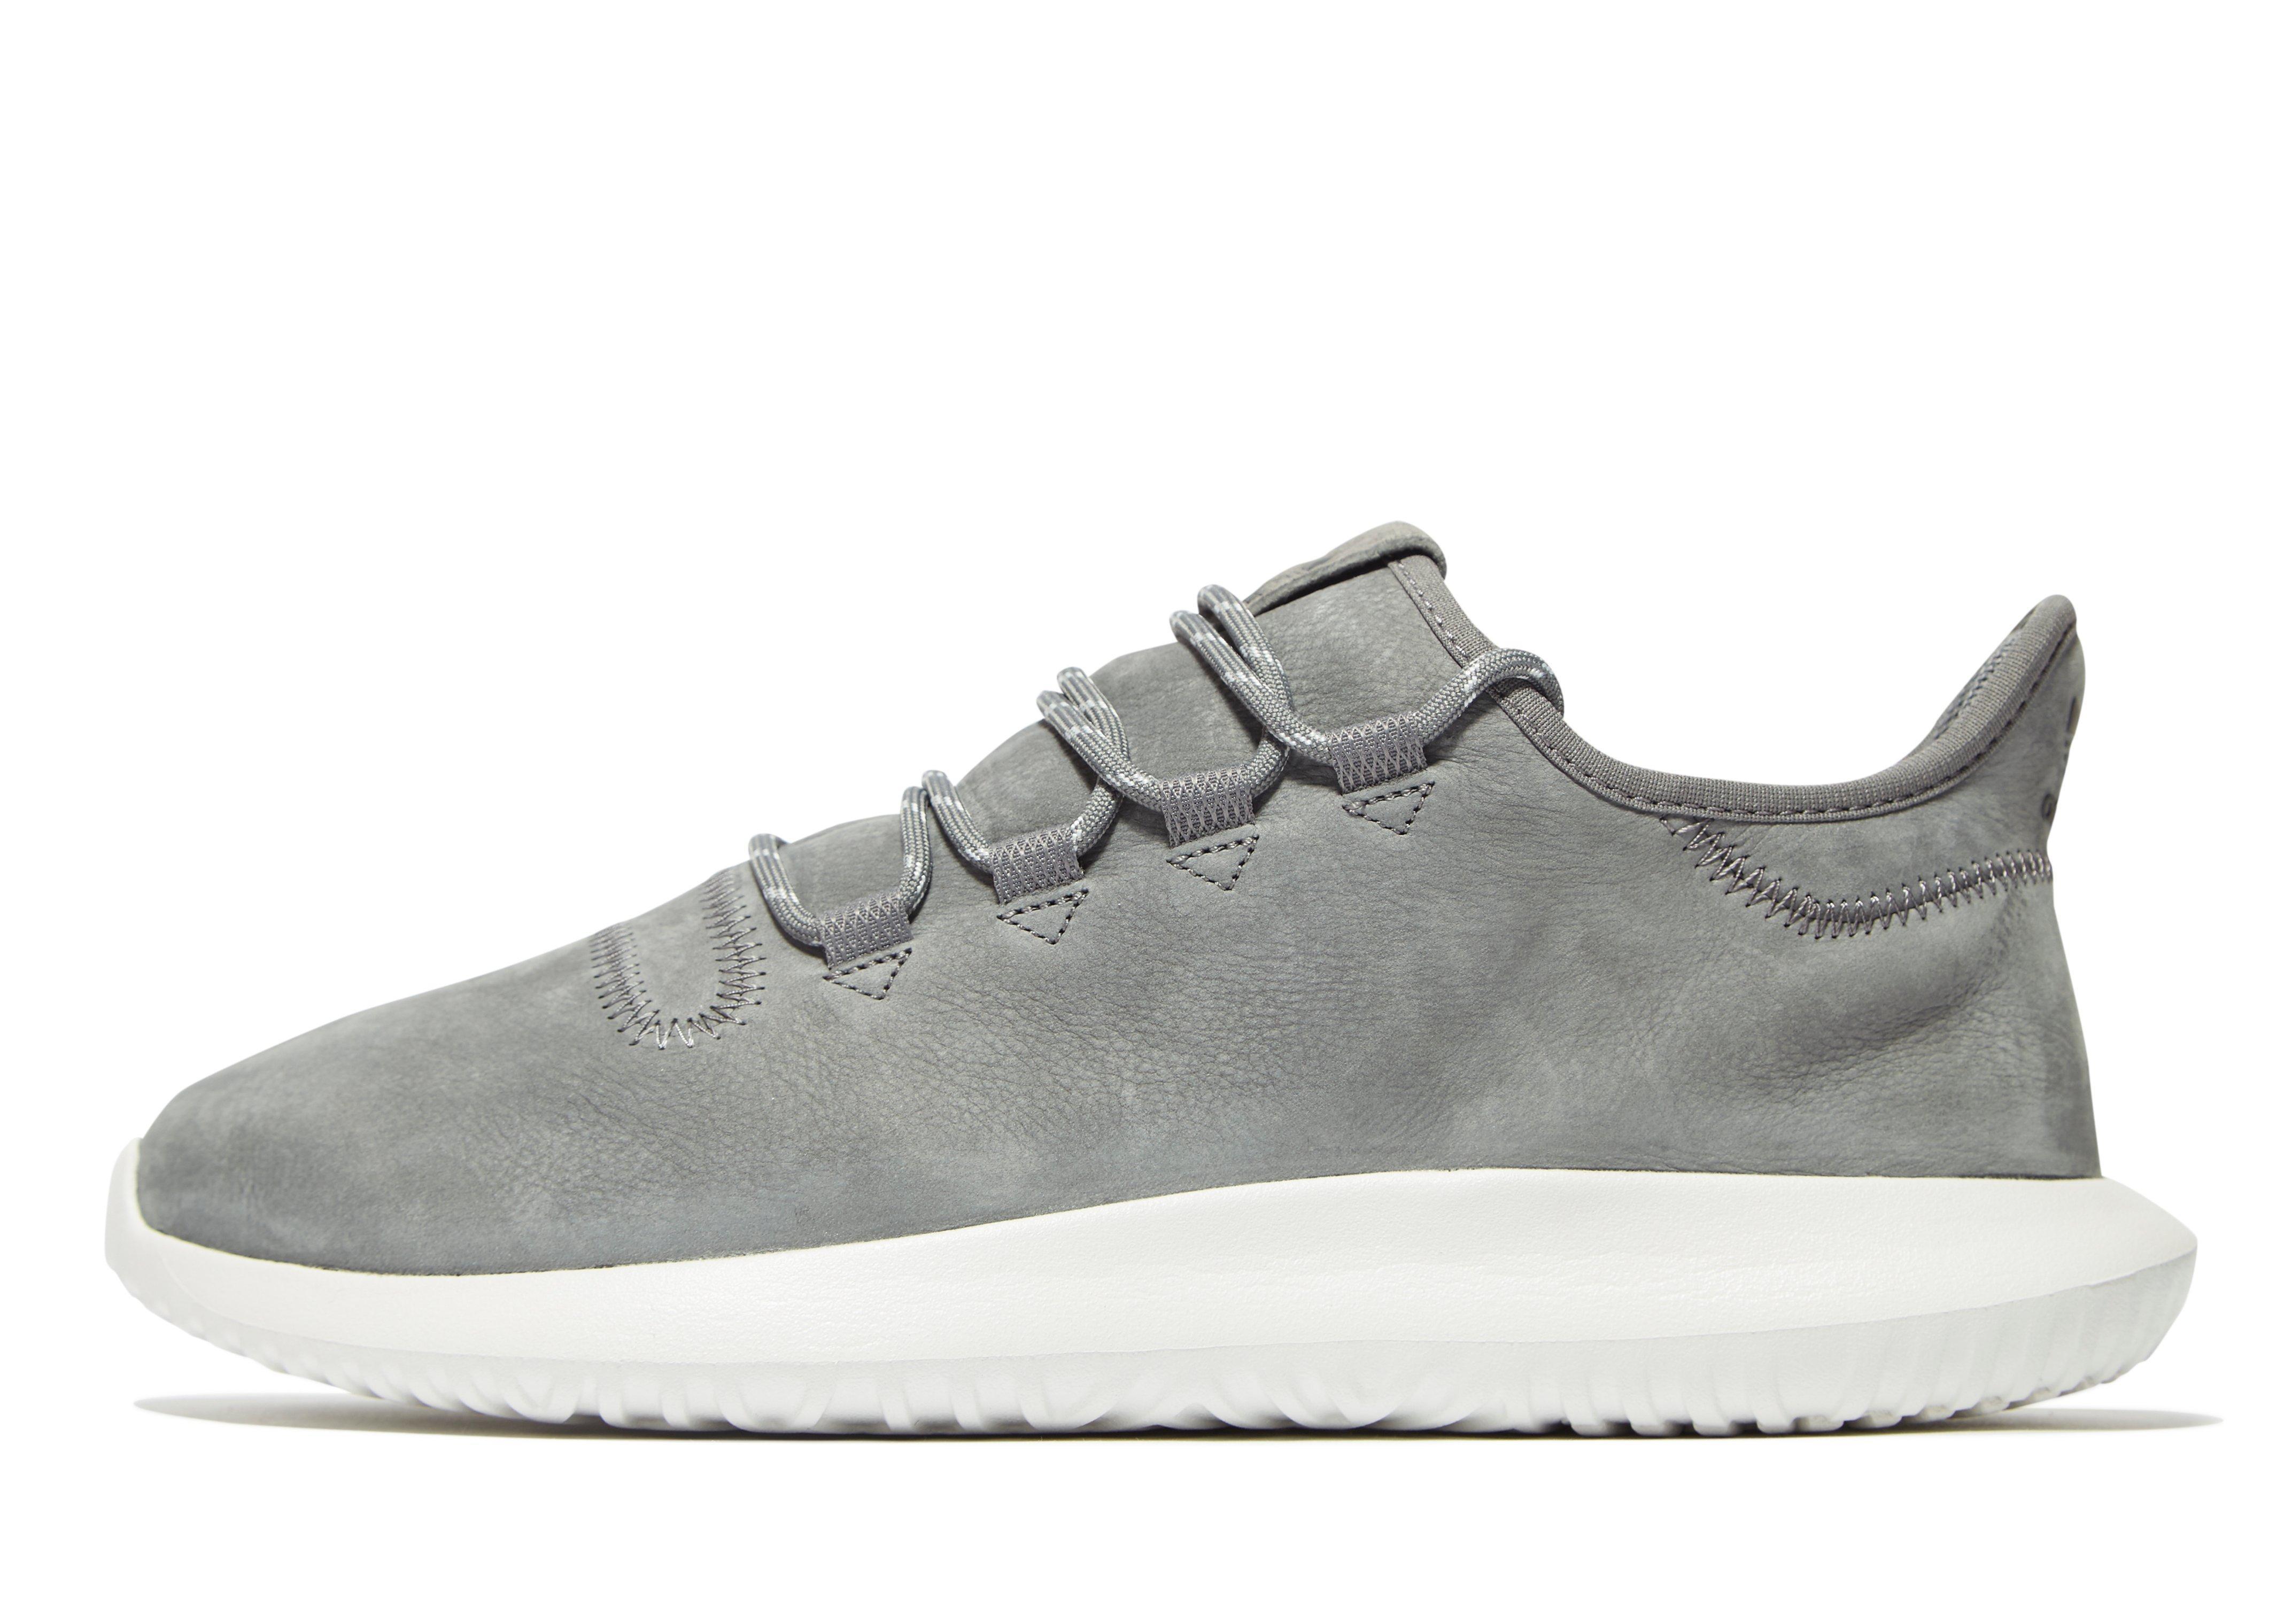 ... shoes size 11 6633b e1072  inexpensive adidas originals. mens gray tubular  shadow leather f41c0 f8721 d288237fb